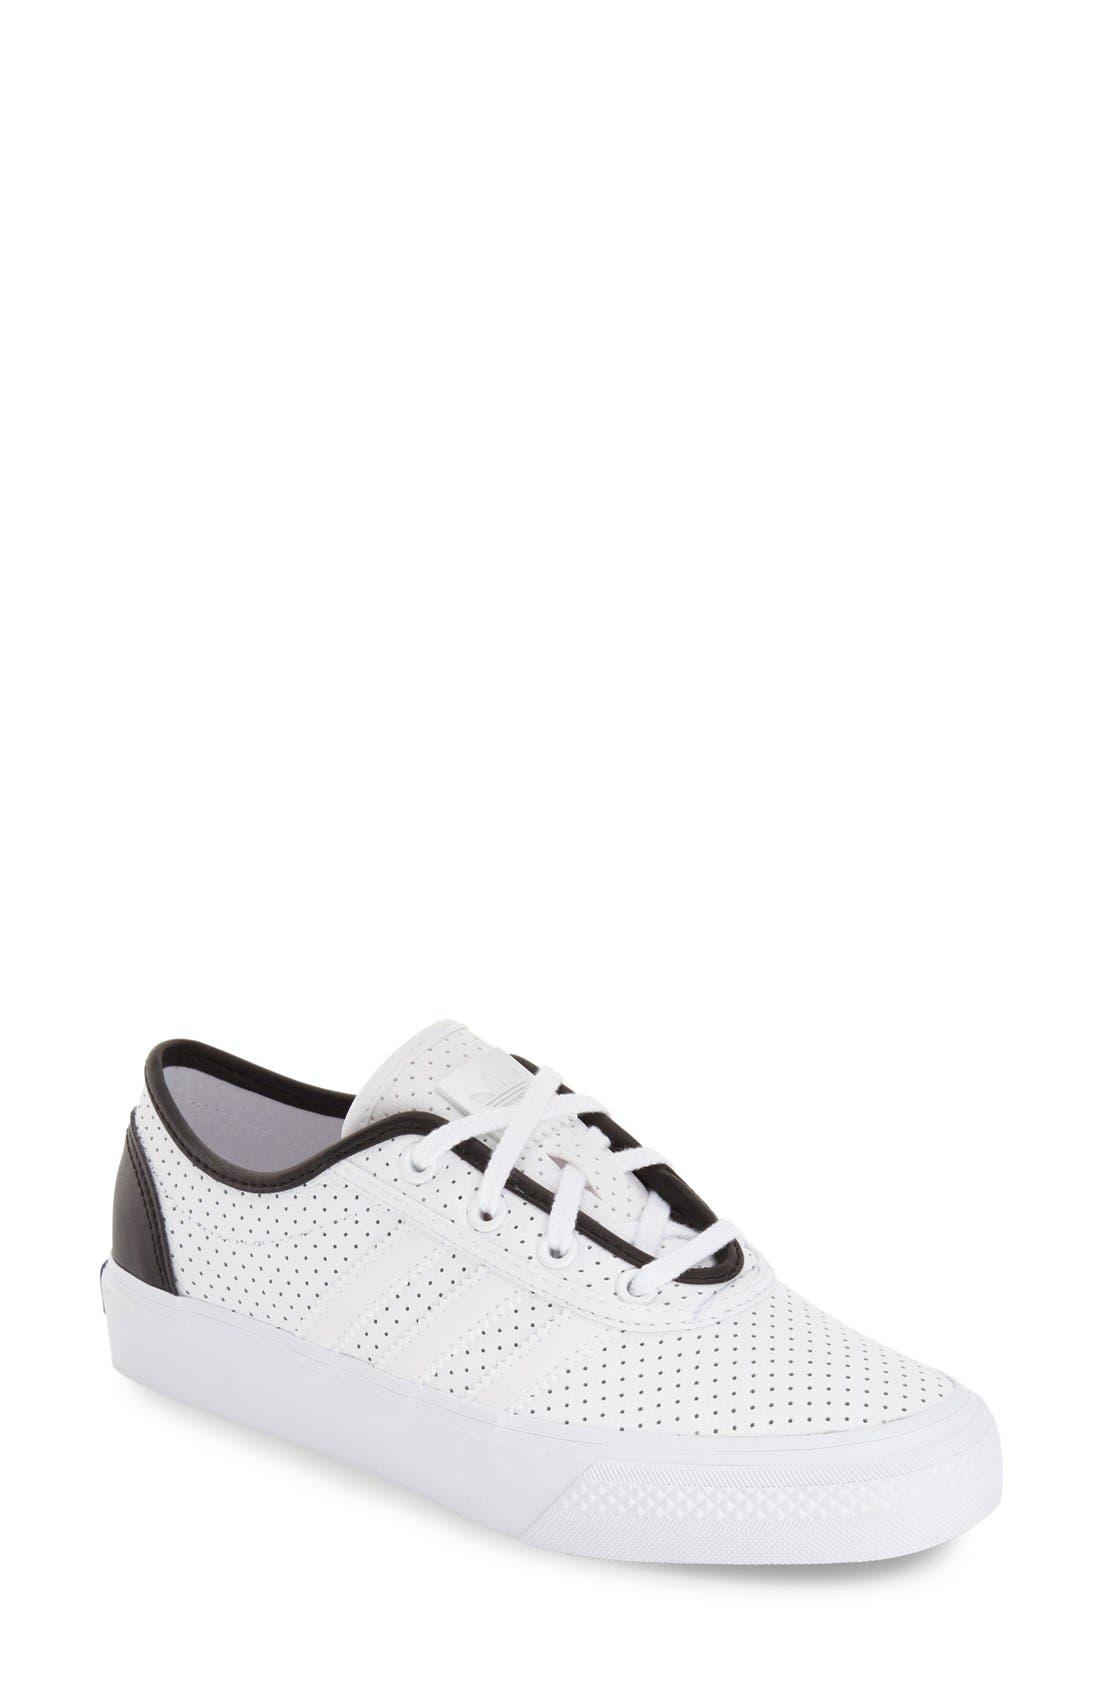 Alternate Image 1 Selected - adidas 'Adi Ease' Sneaker (Women)